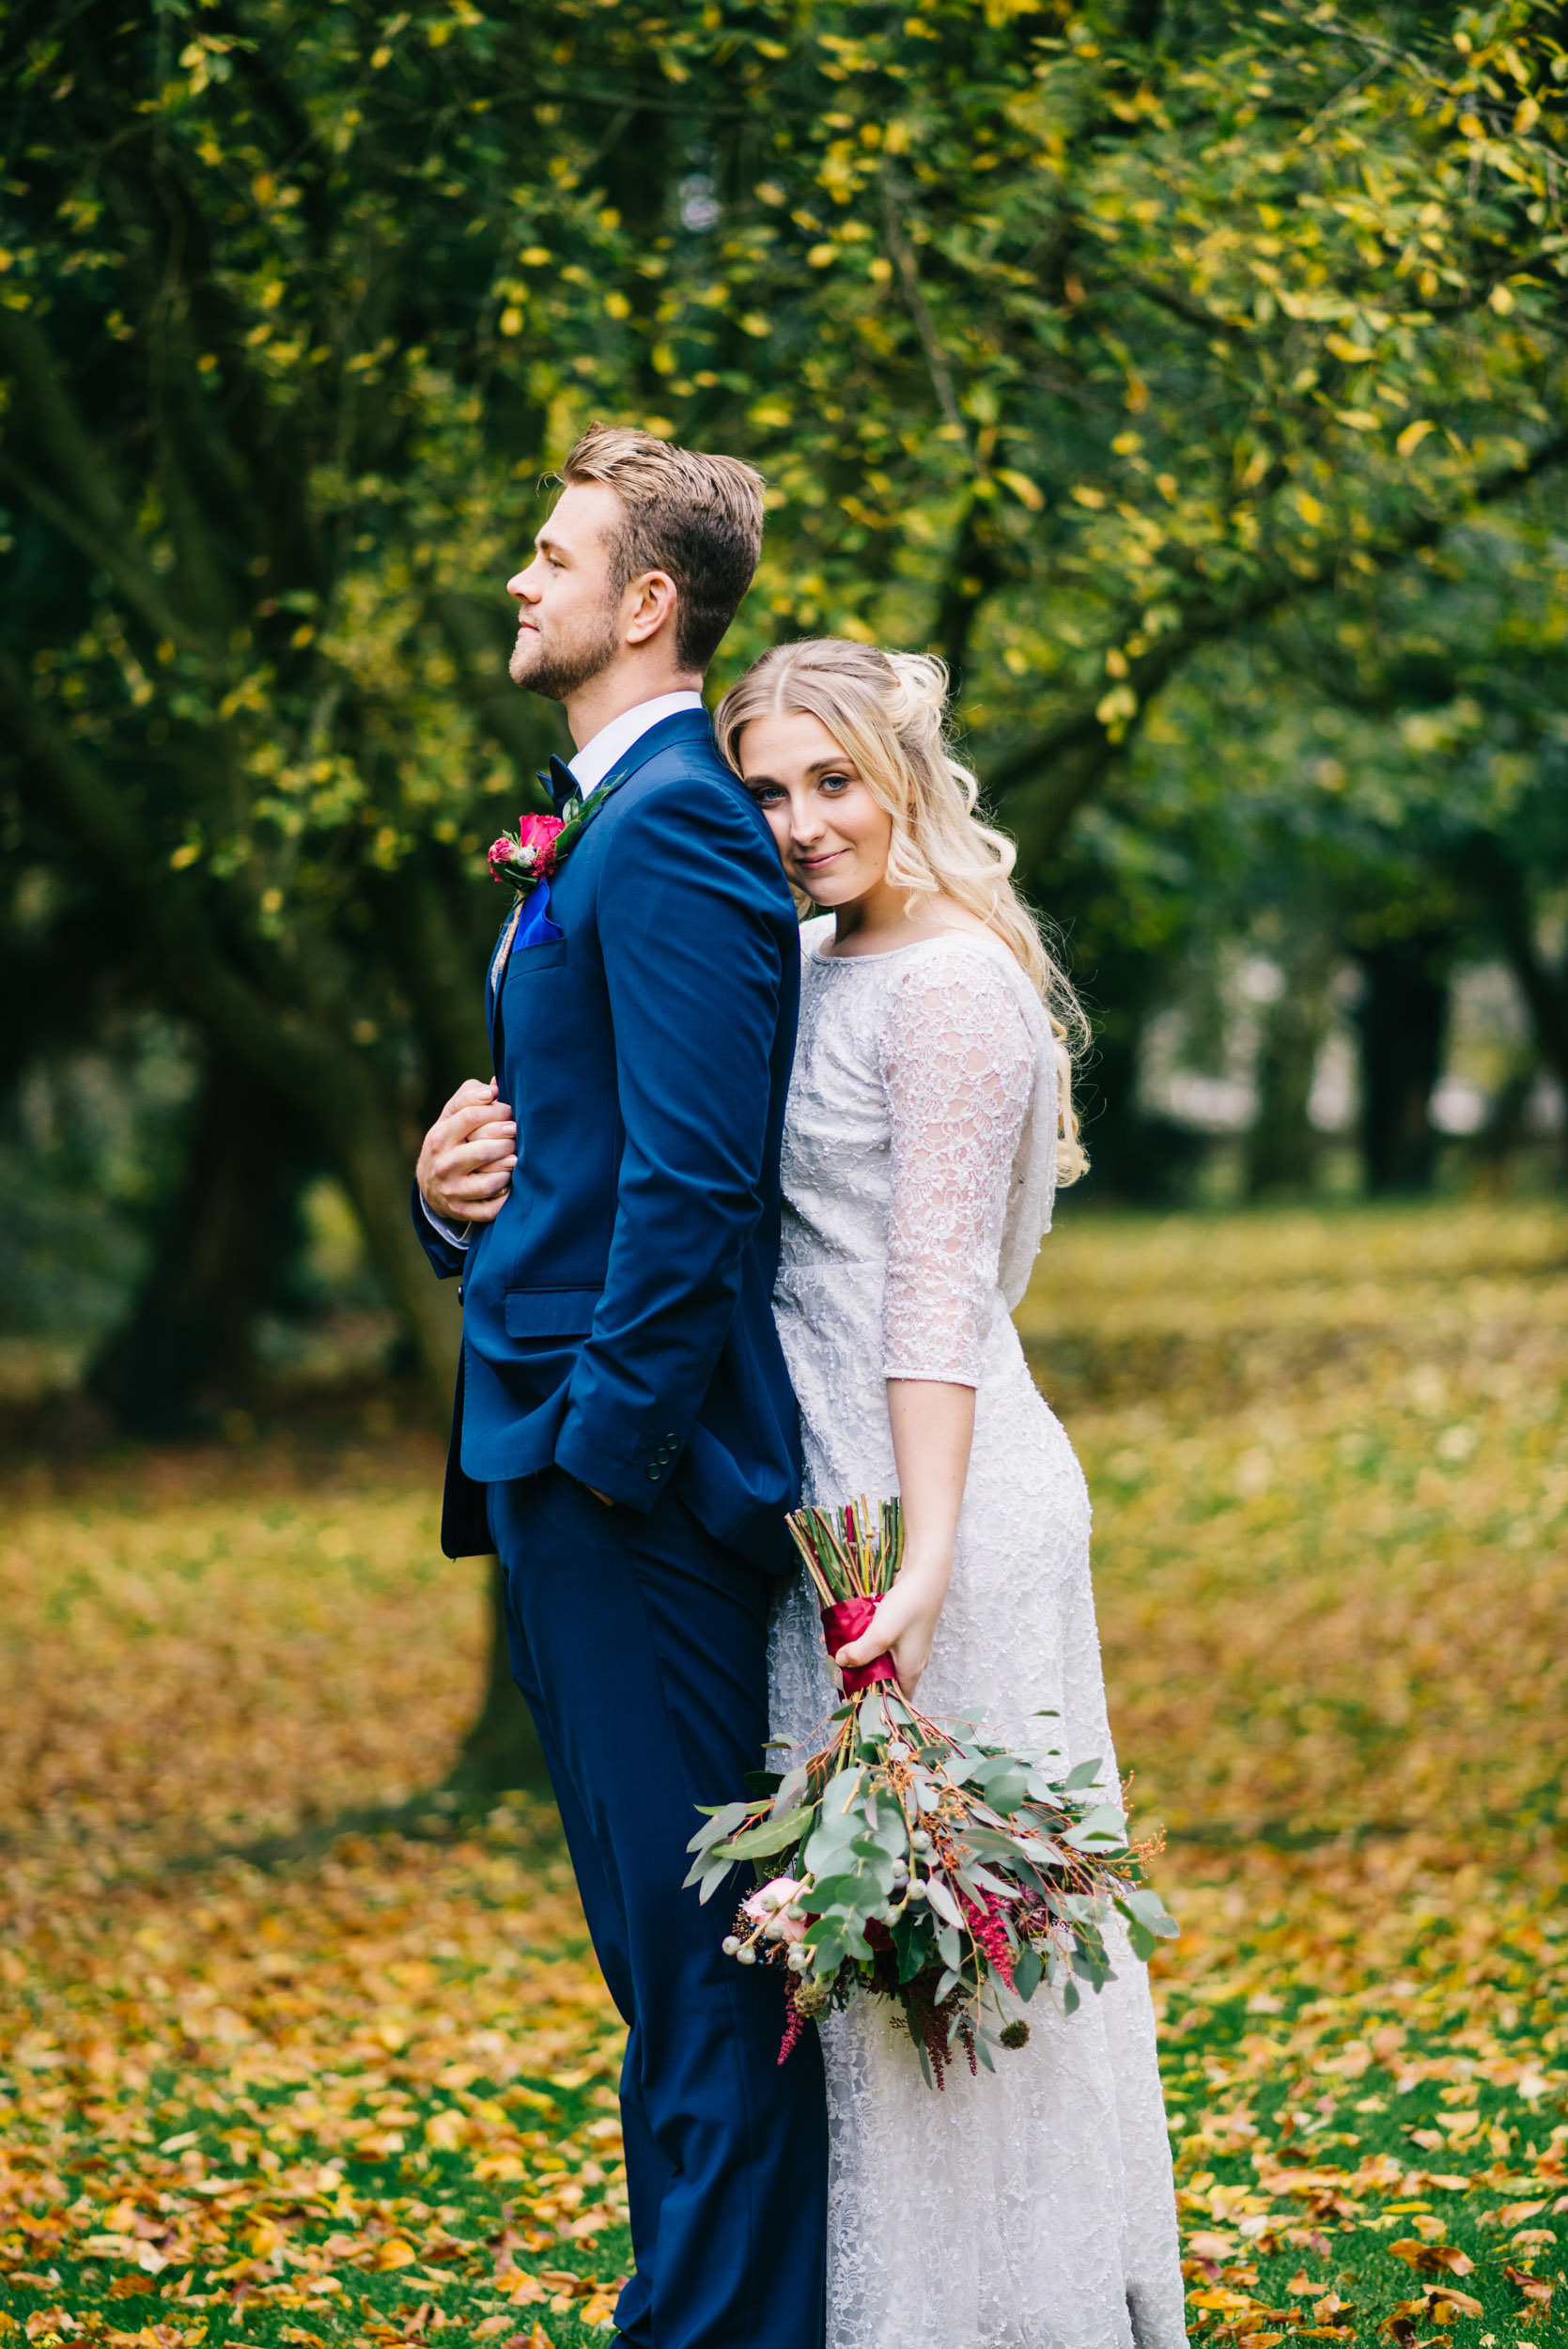 Mitton Hall, Wedding Venue Lancashire, Styled Wedding Workshop36